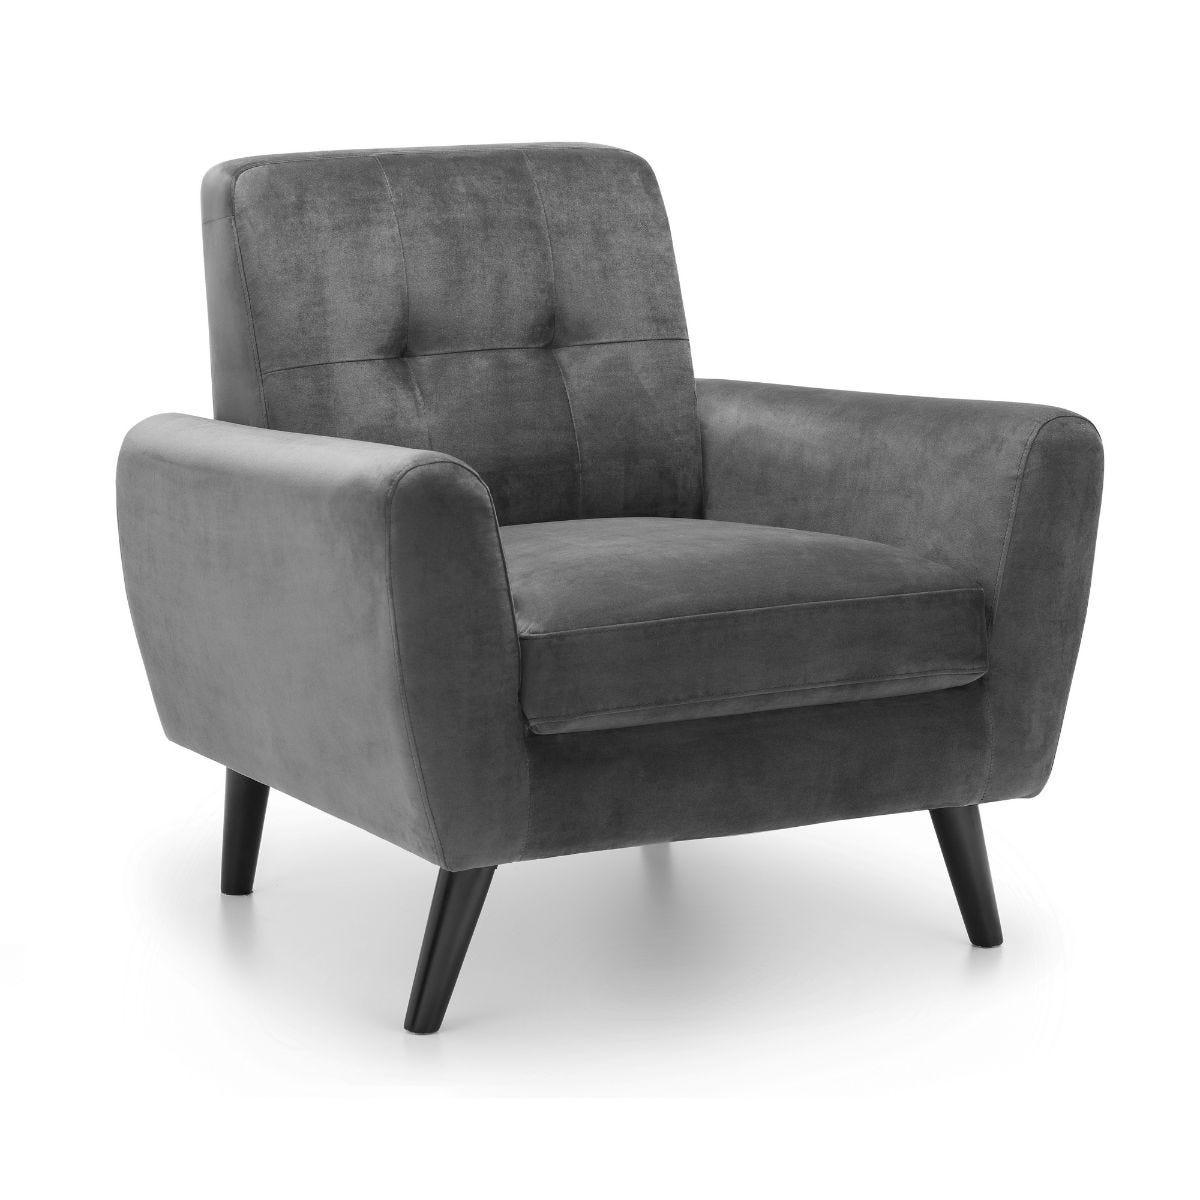 Julian Bowen Monza Armchair in Dark Grey Velvet